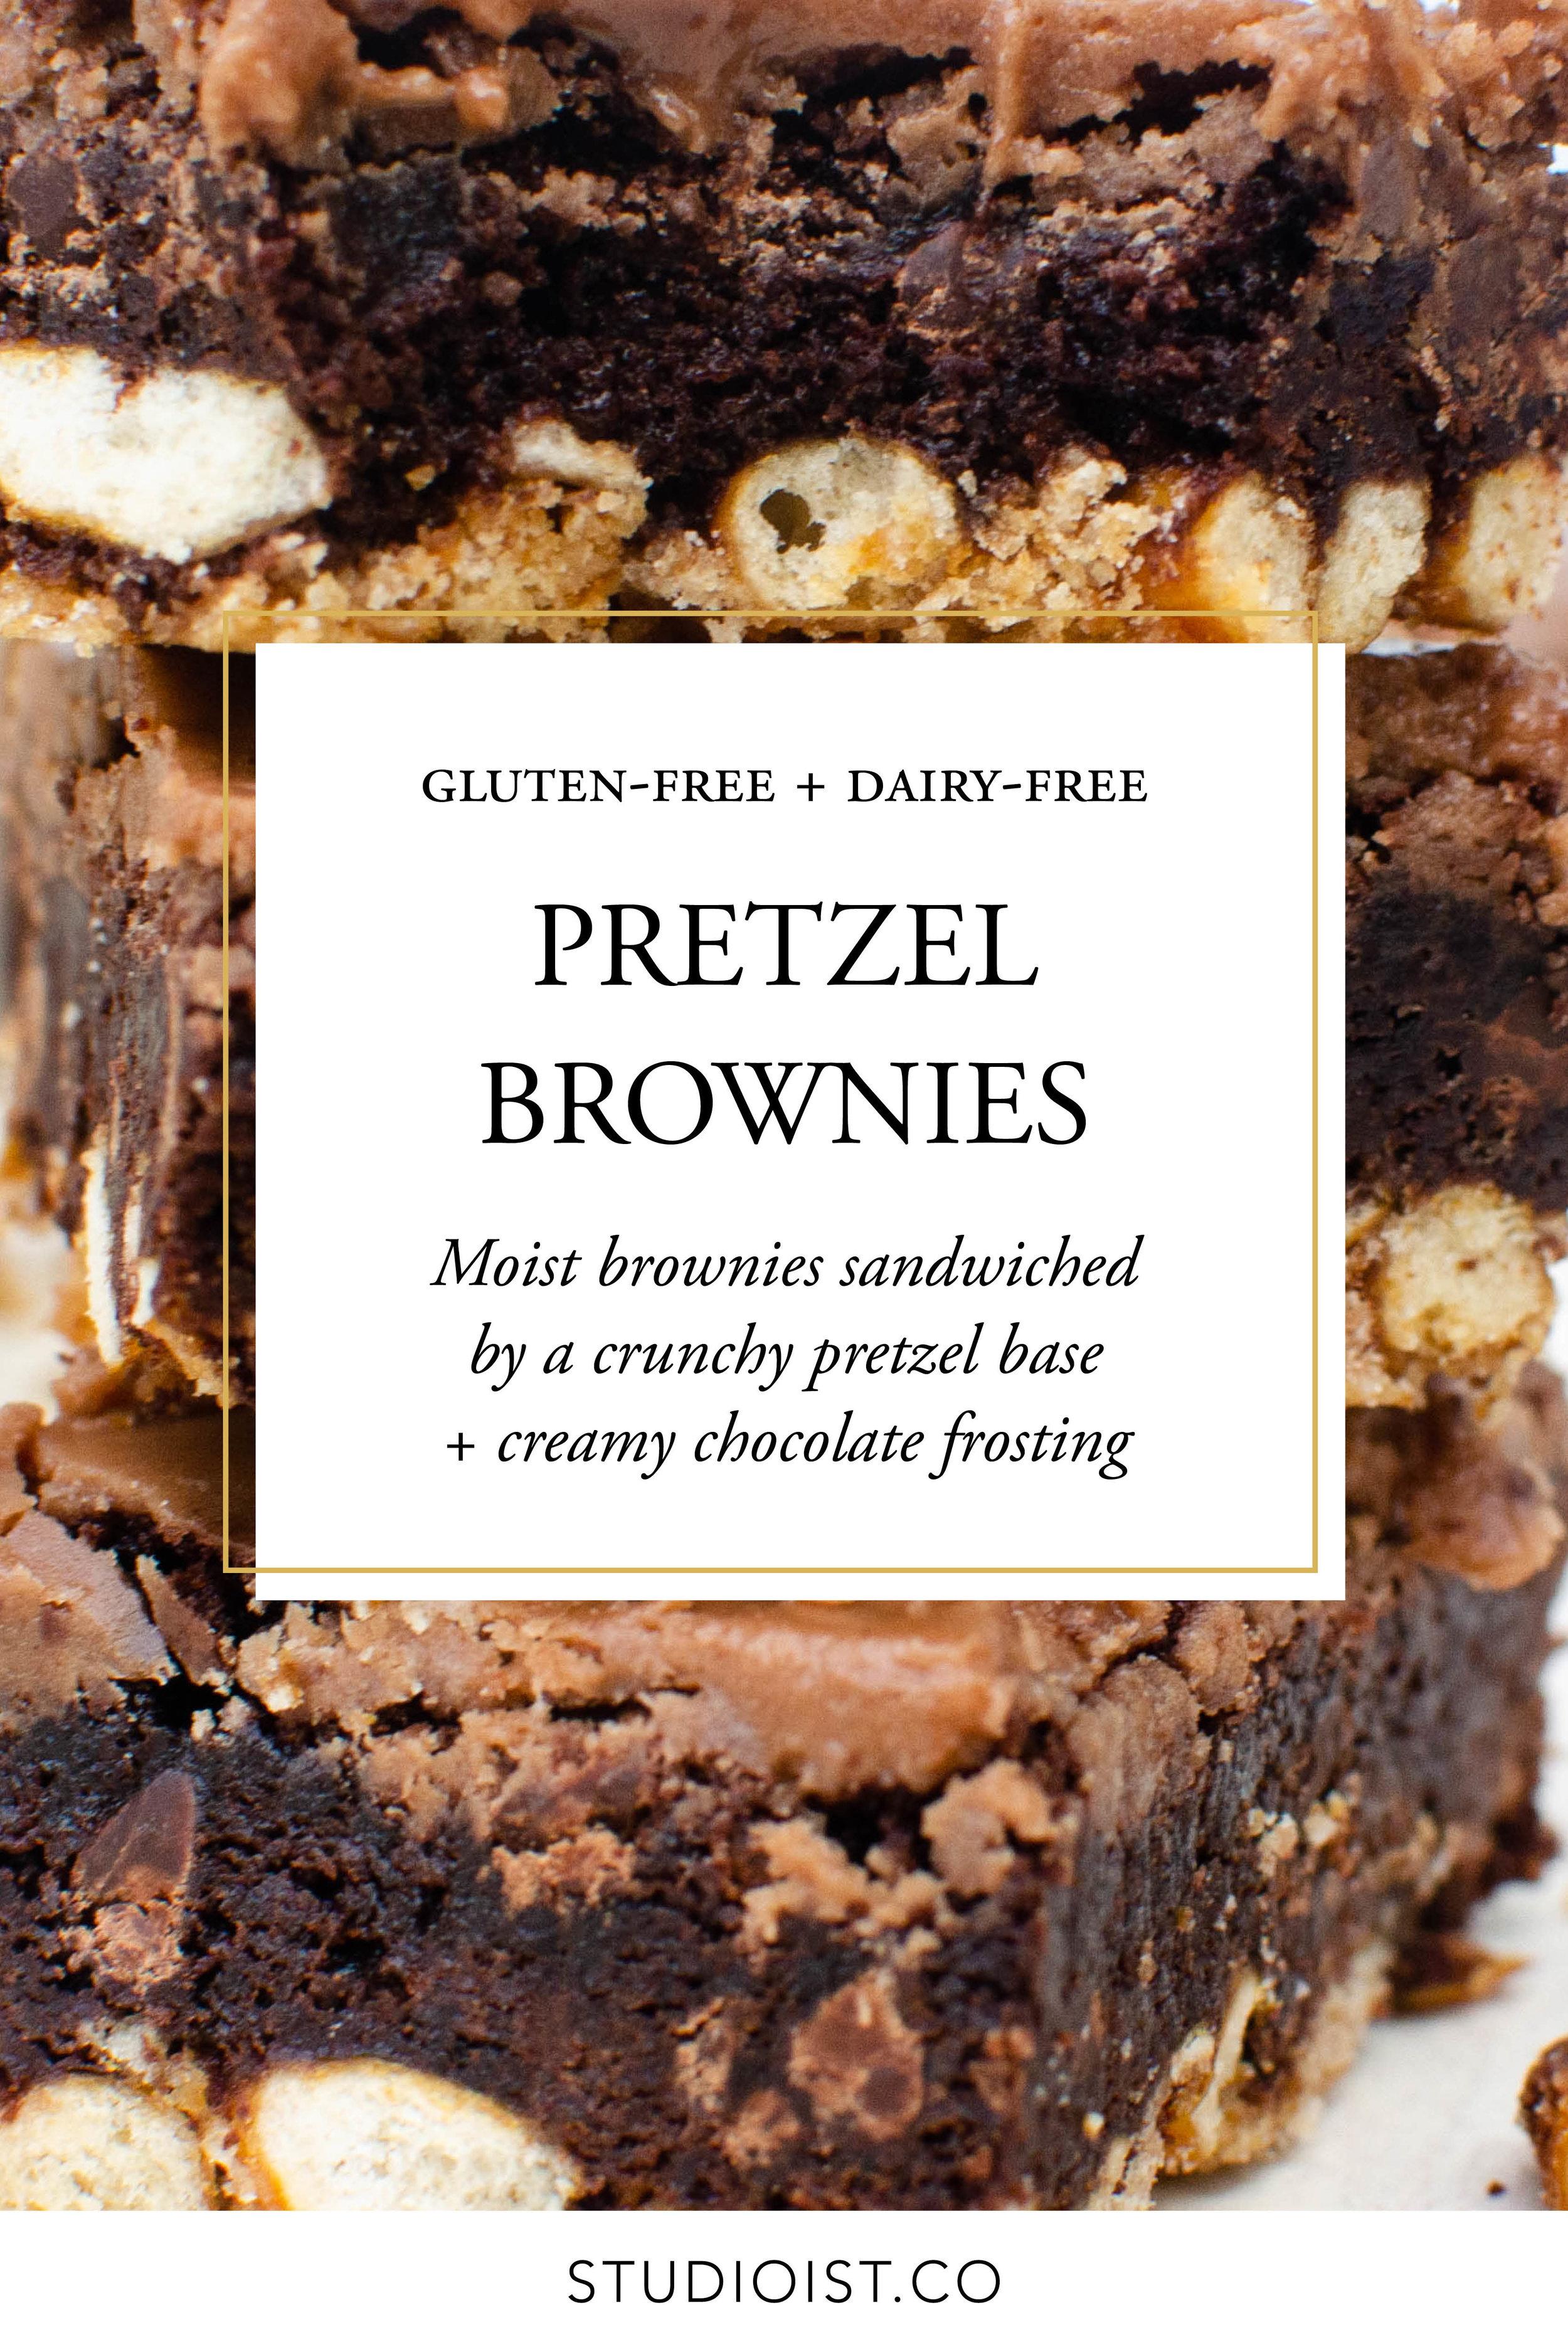 Gluten Free Dairy Free Pretzel Brownies_Studioist.jpg